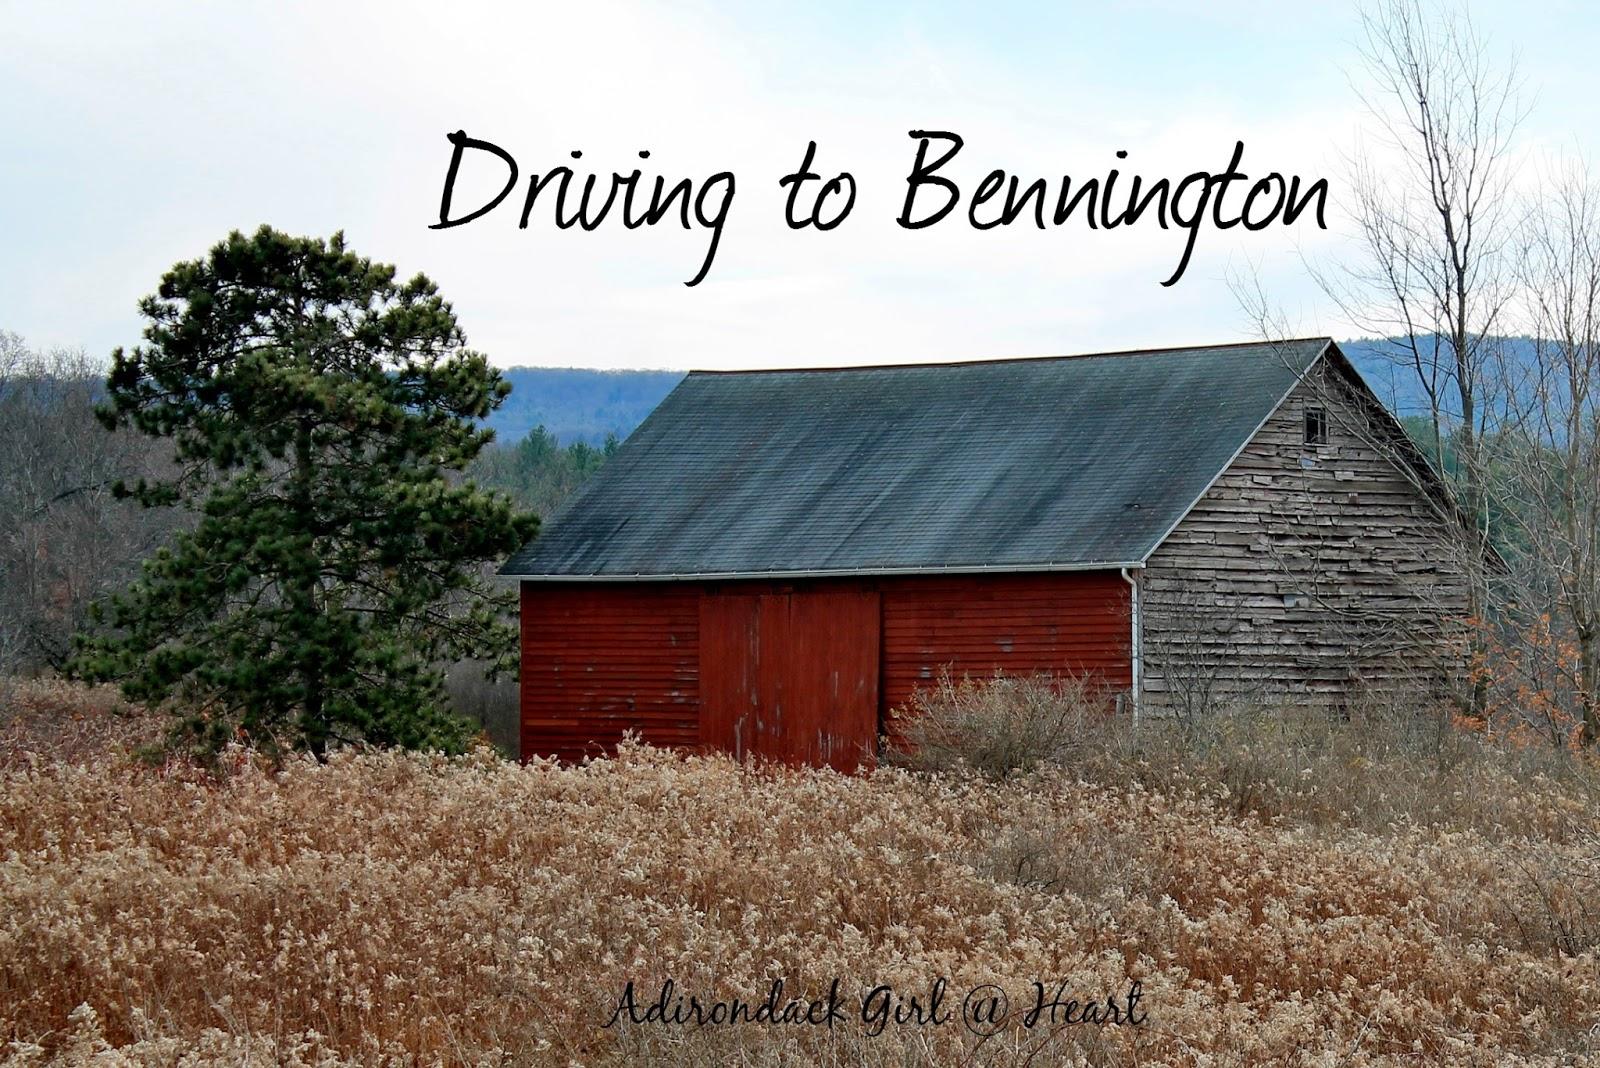 Driving to Bennington (VT)